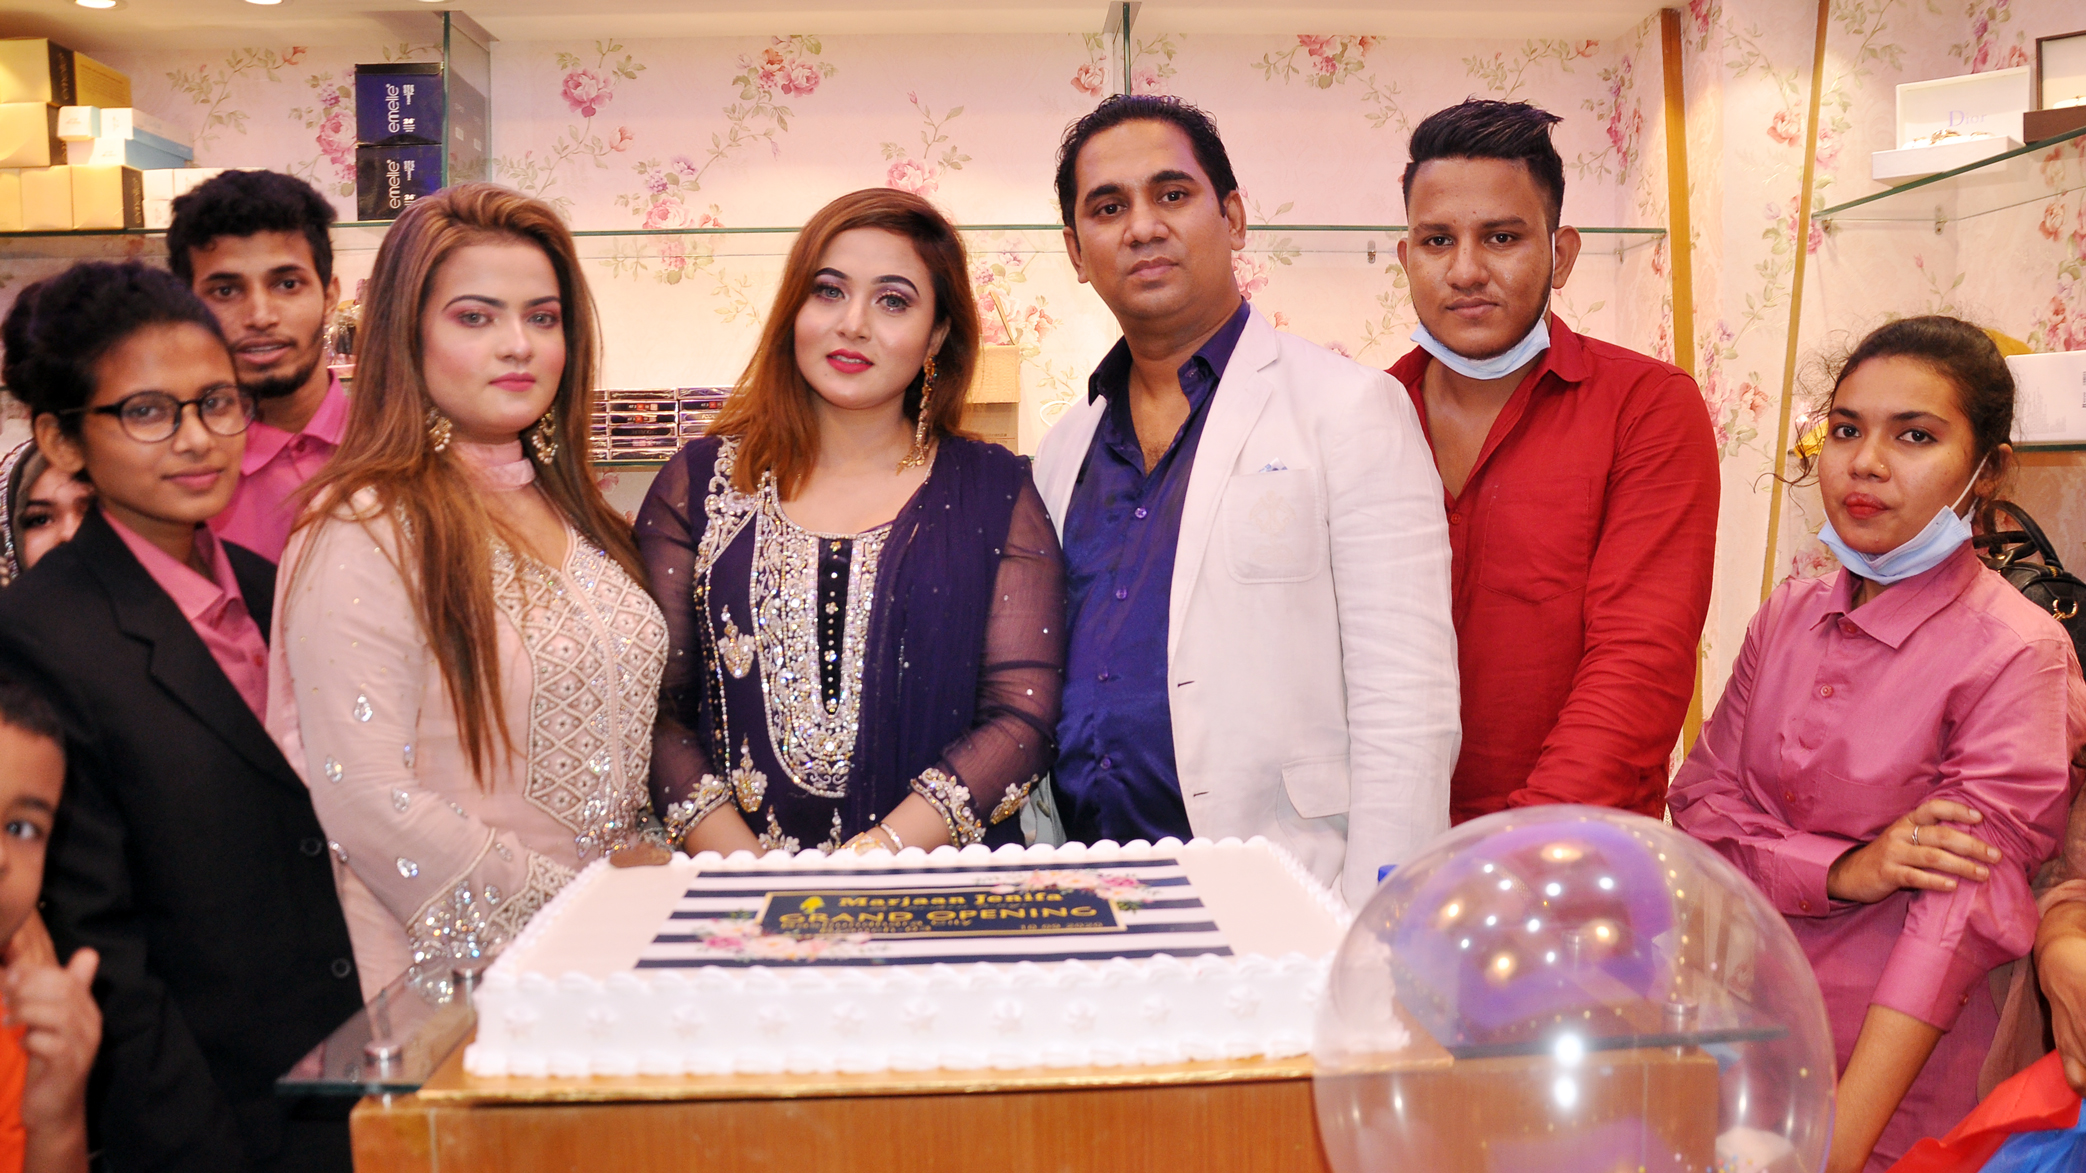 MJ Fashion opens third store in Bashundhara city